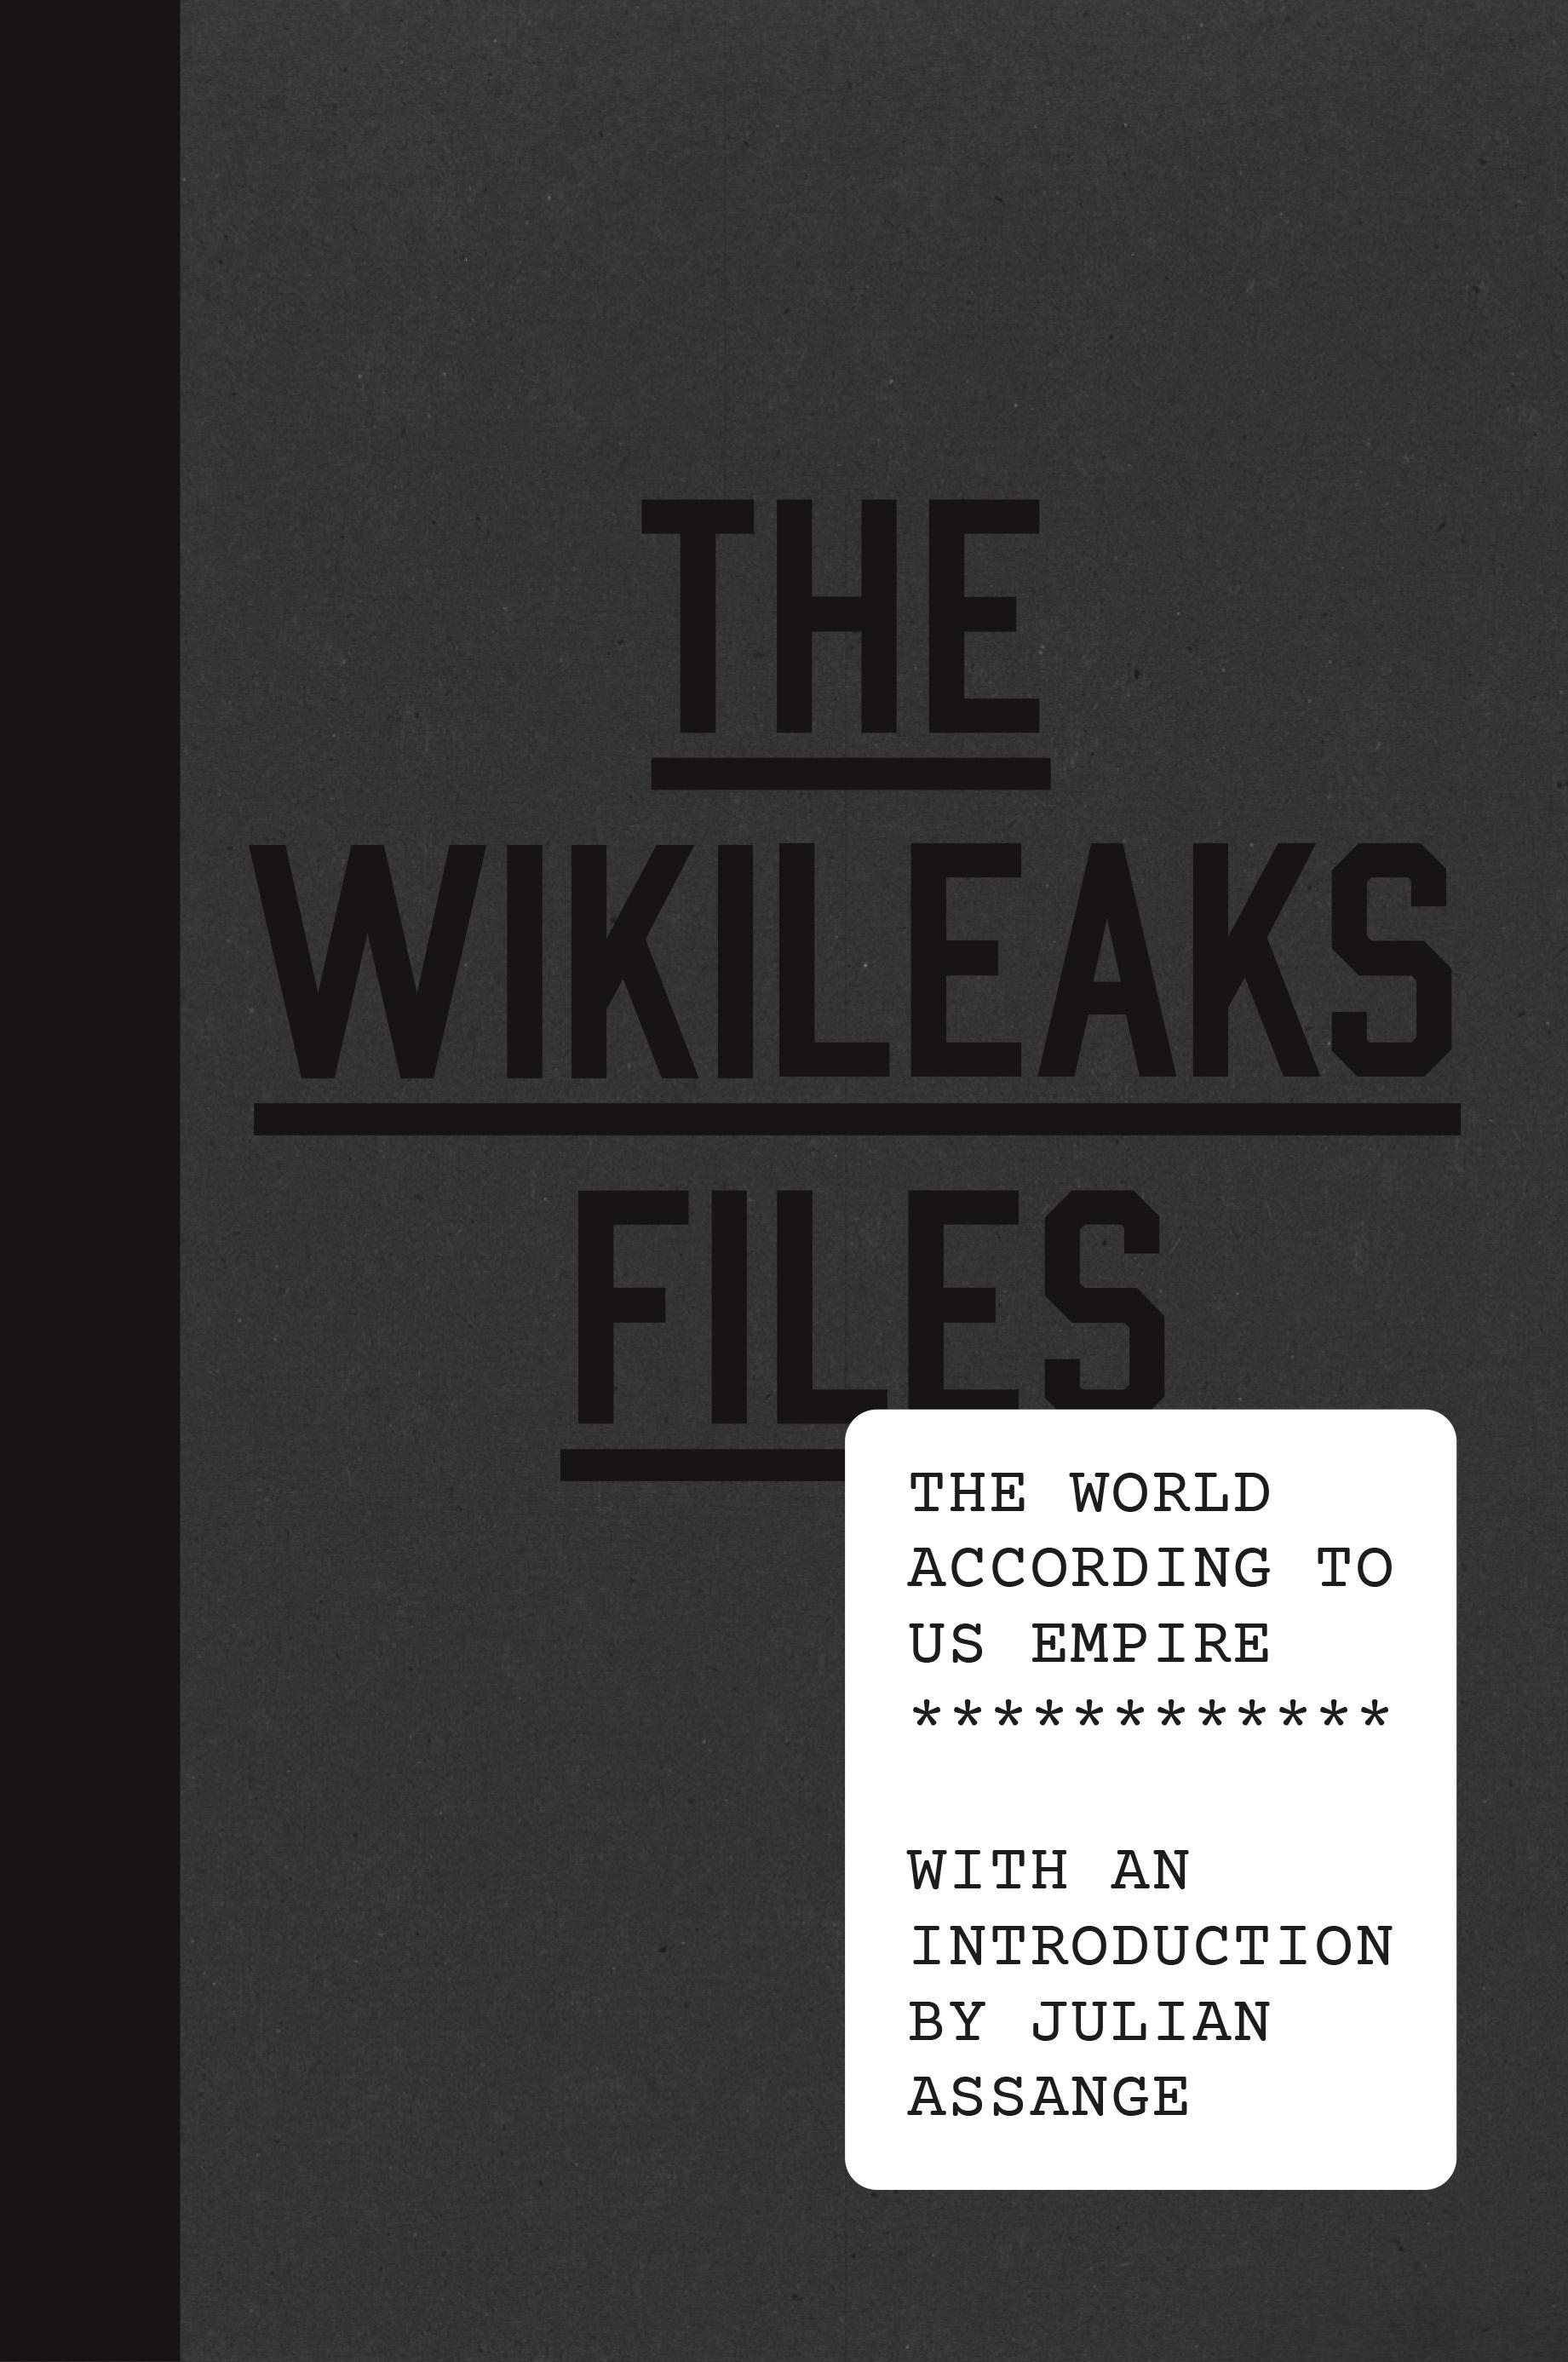 thesis statement wikileaks